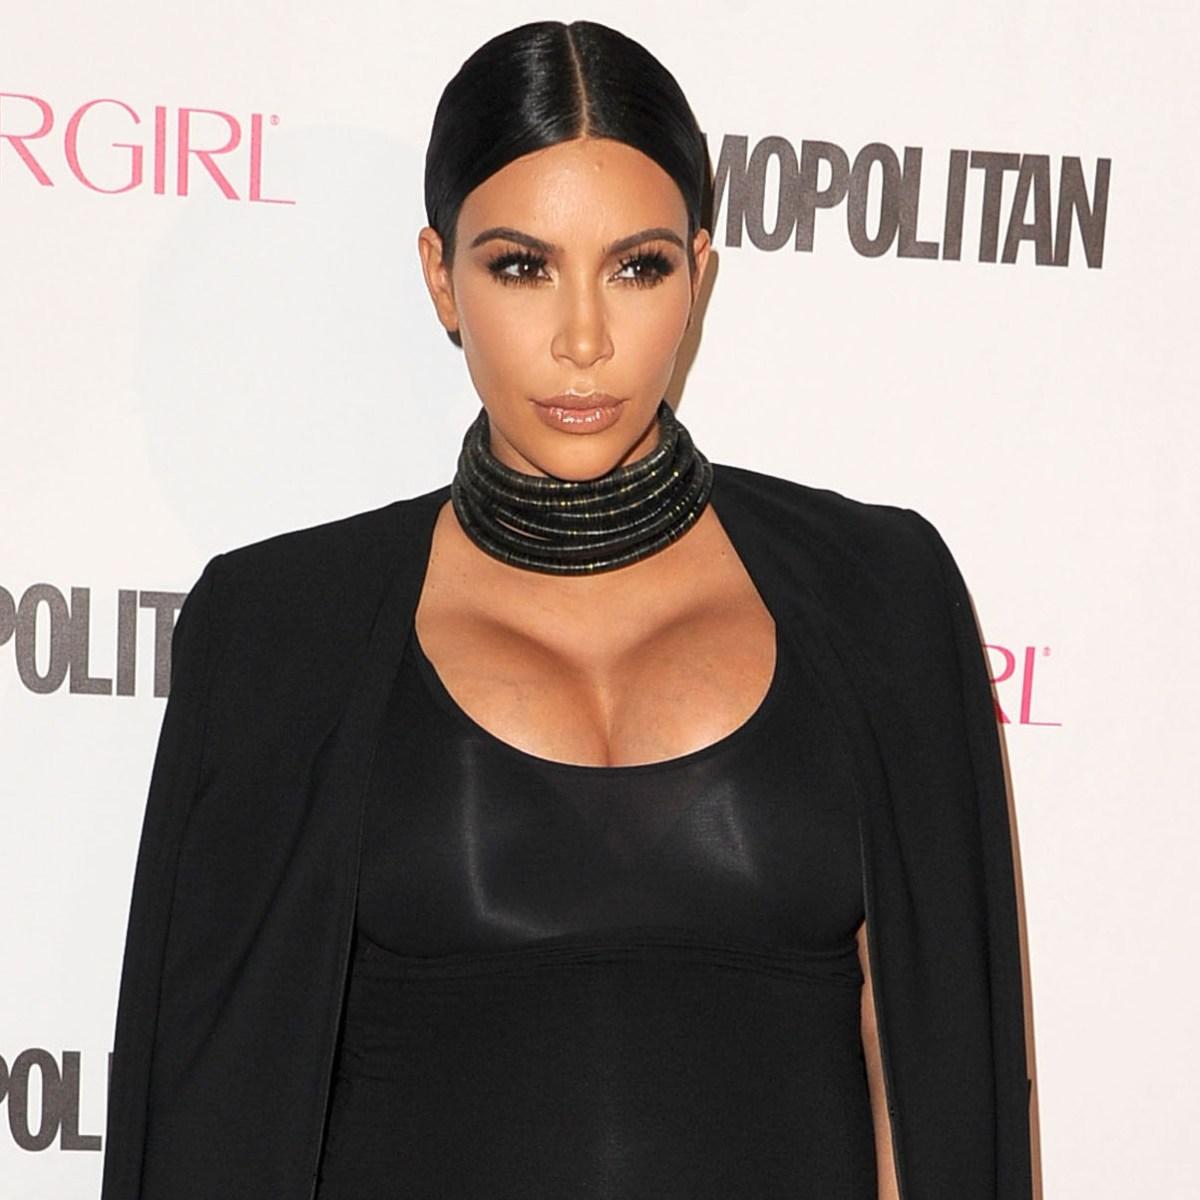 Kim Kardashian Flaunts Massive Pregnancy Boobs in New Instagram Photo -  Life & Style